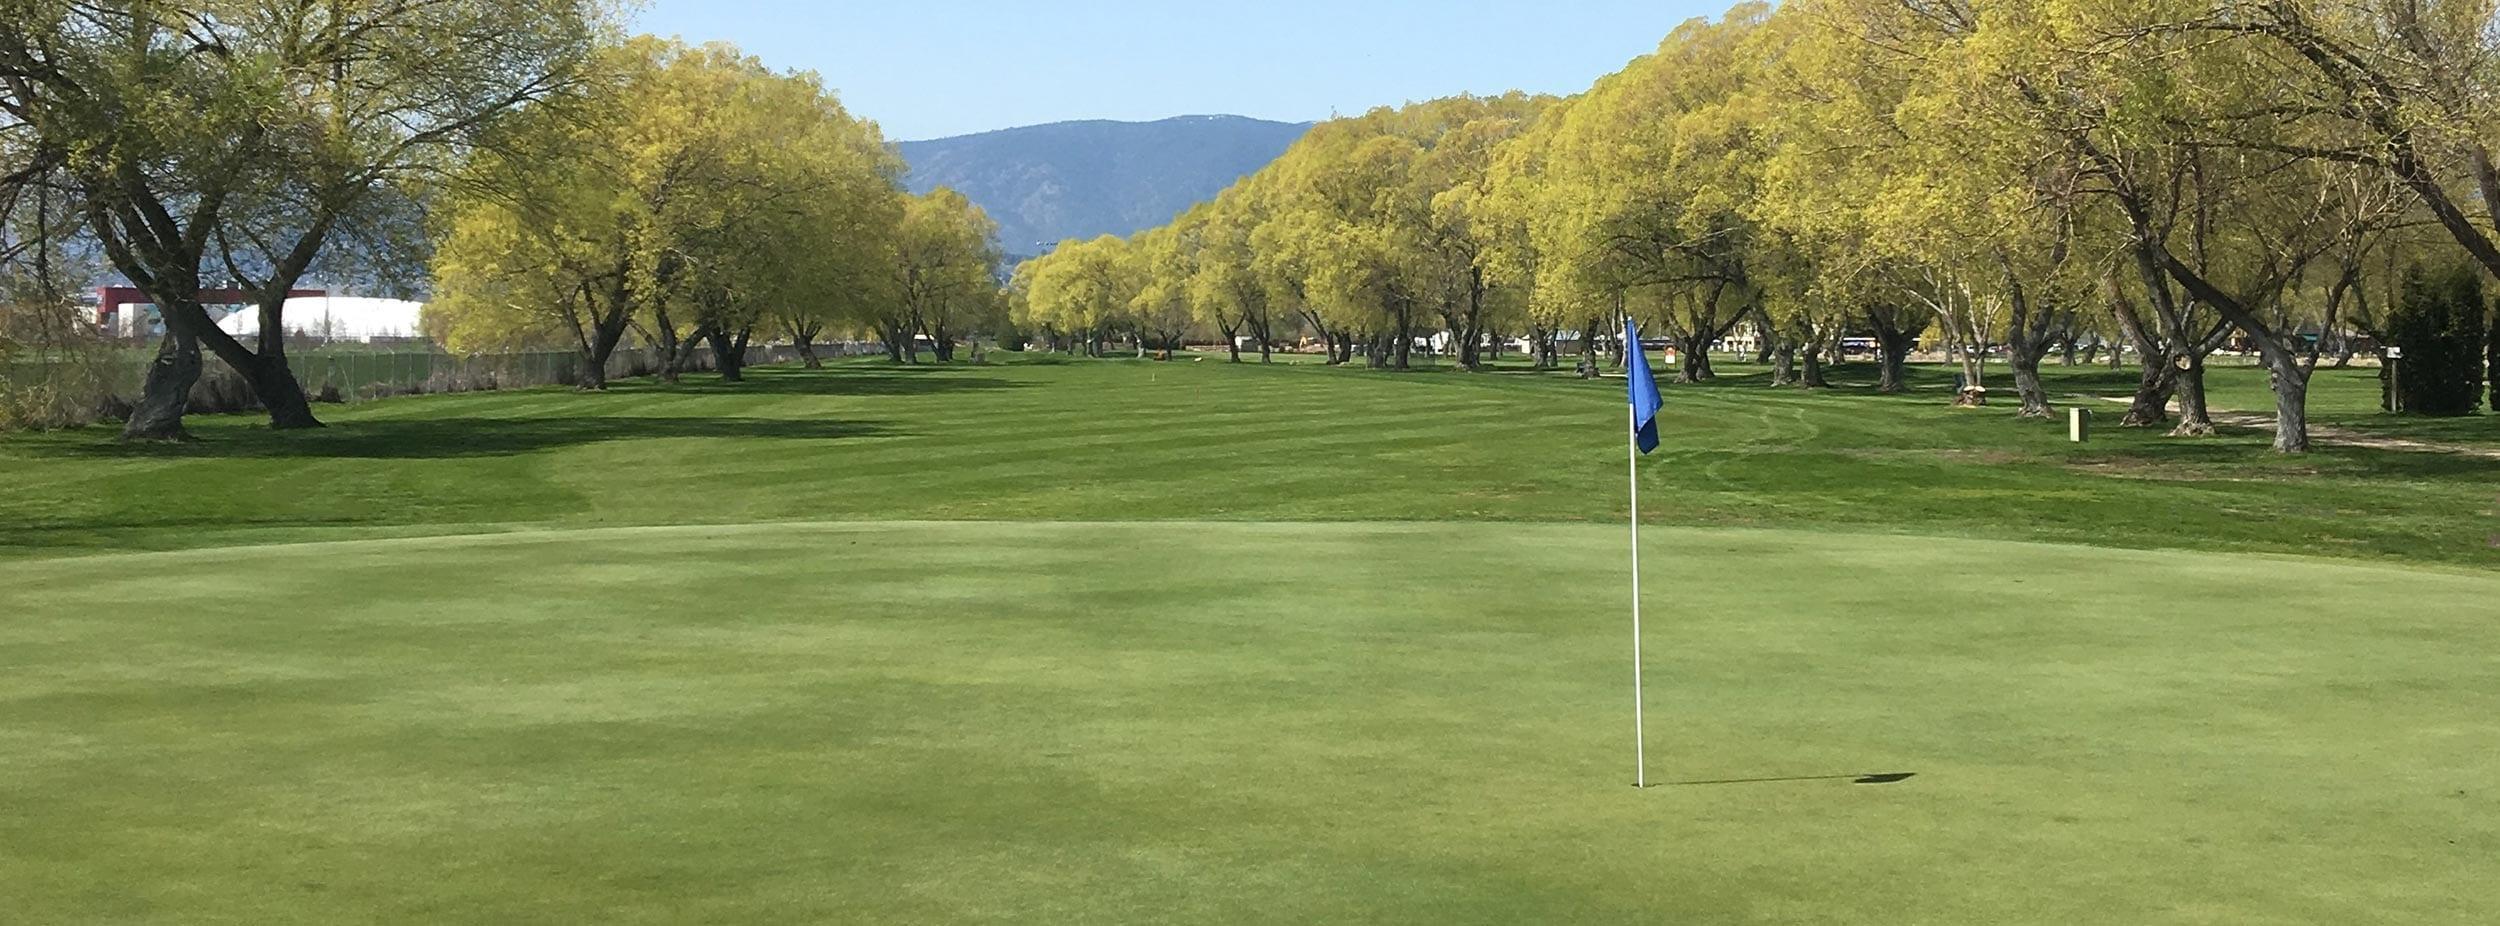 MichaelBrook-Golf Course Fairway